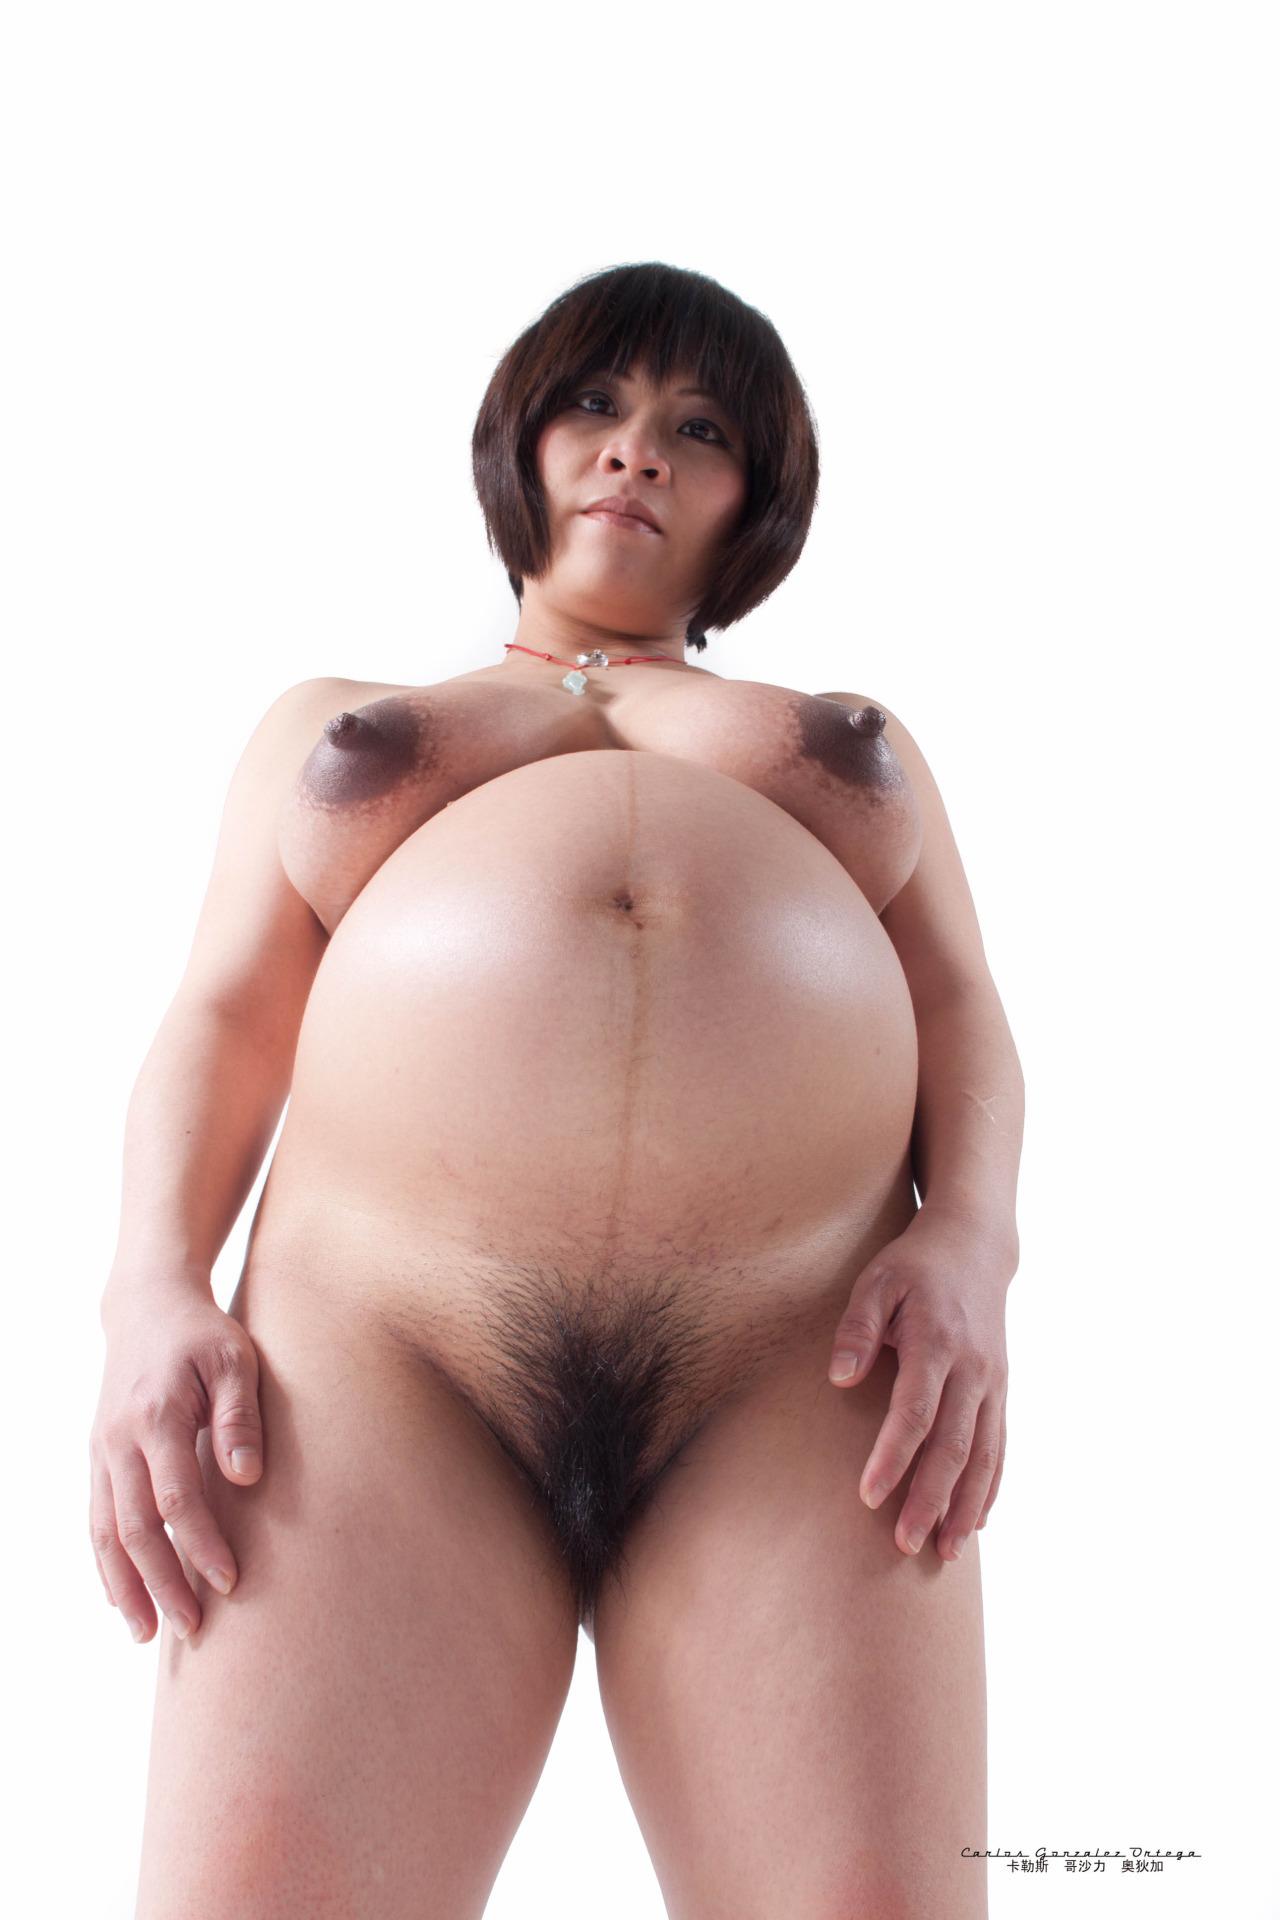 Pregnant asian girl sex